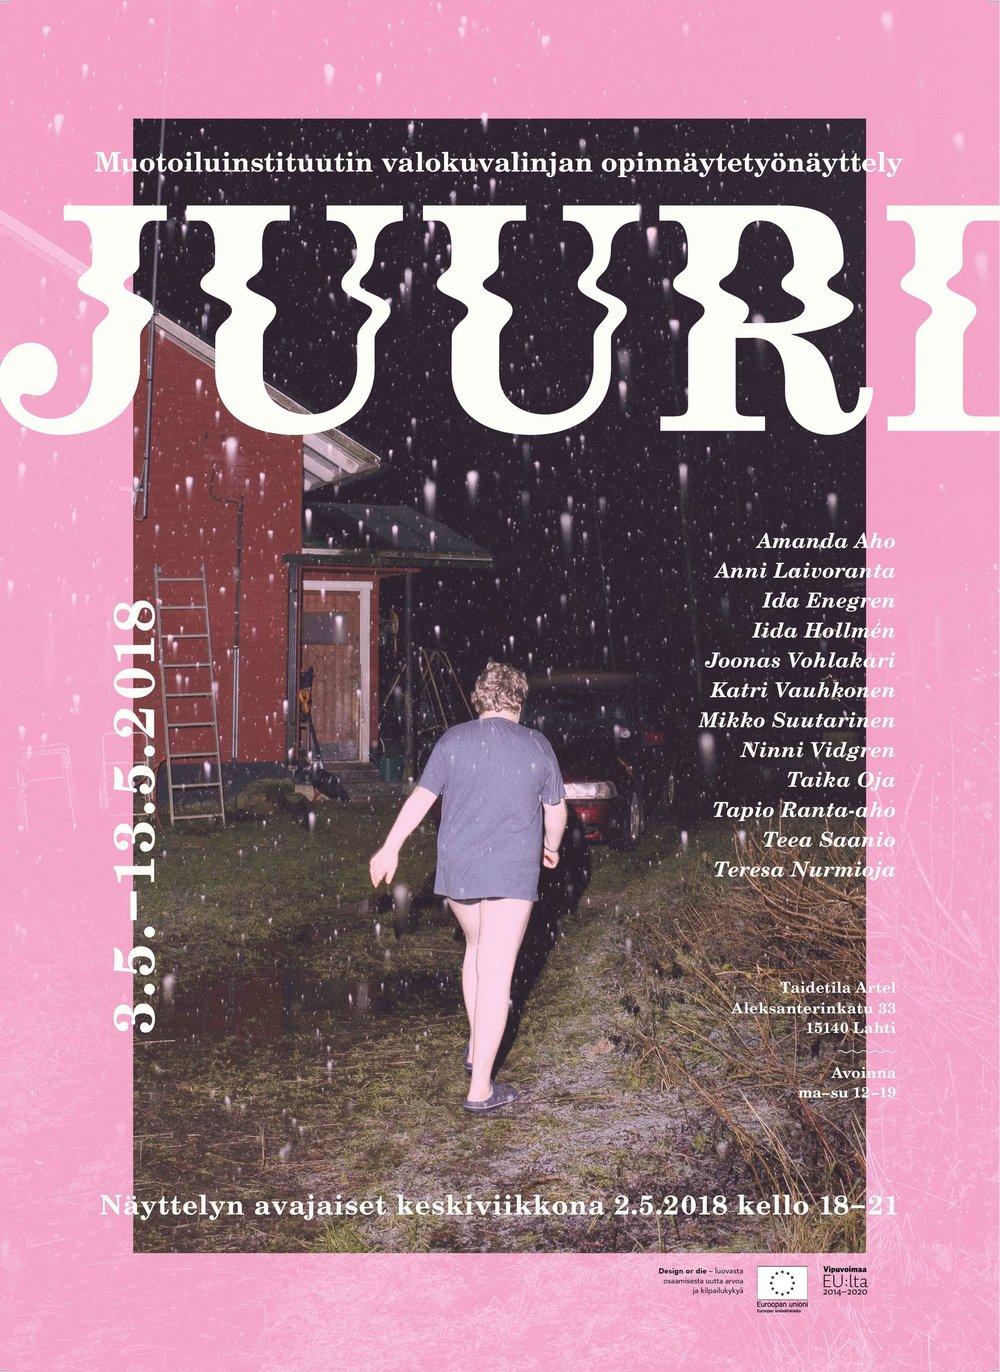 Juuri   Thesis Exhibition @ Taidetila Artel, Lahti 3.-14.5.2018  Opening: Wednesday 2.5. at 18:00  Facebook event:  Juuri